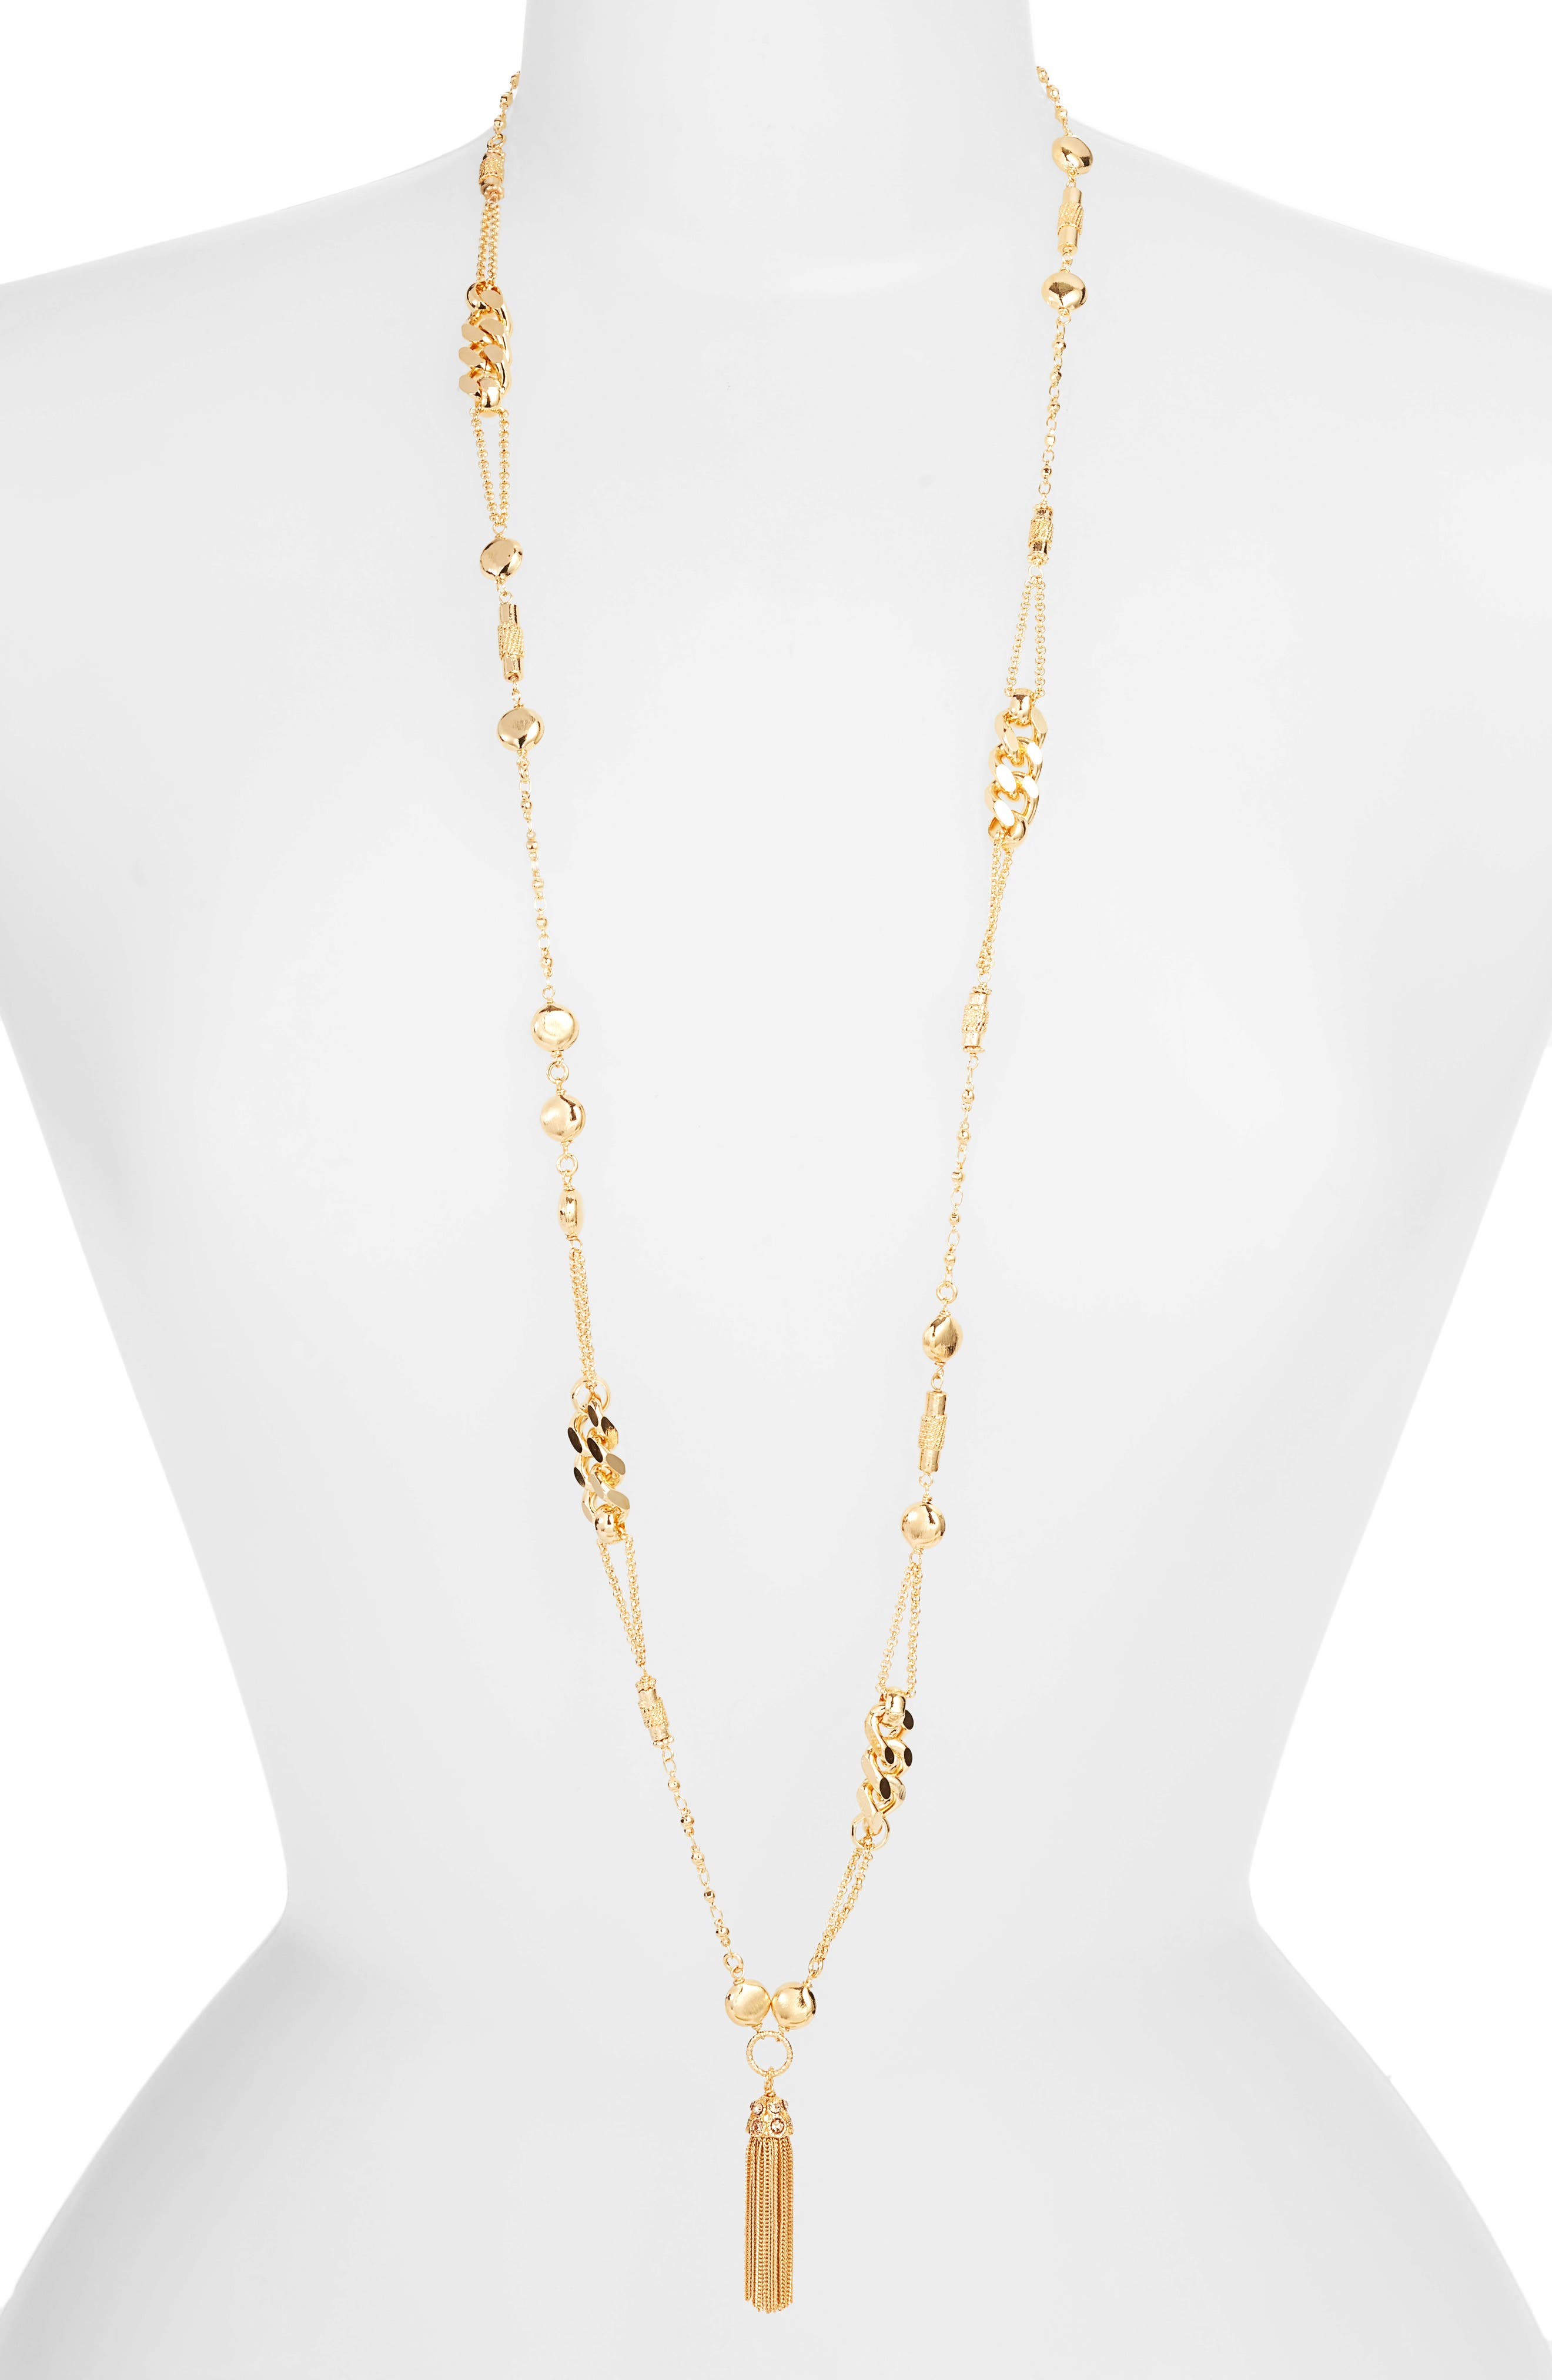 Filou Long Tassel Pendant Necklace,                             Main thumbnail 1, color,                             YELLOW GOLD